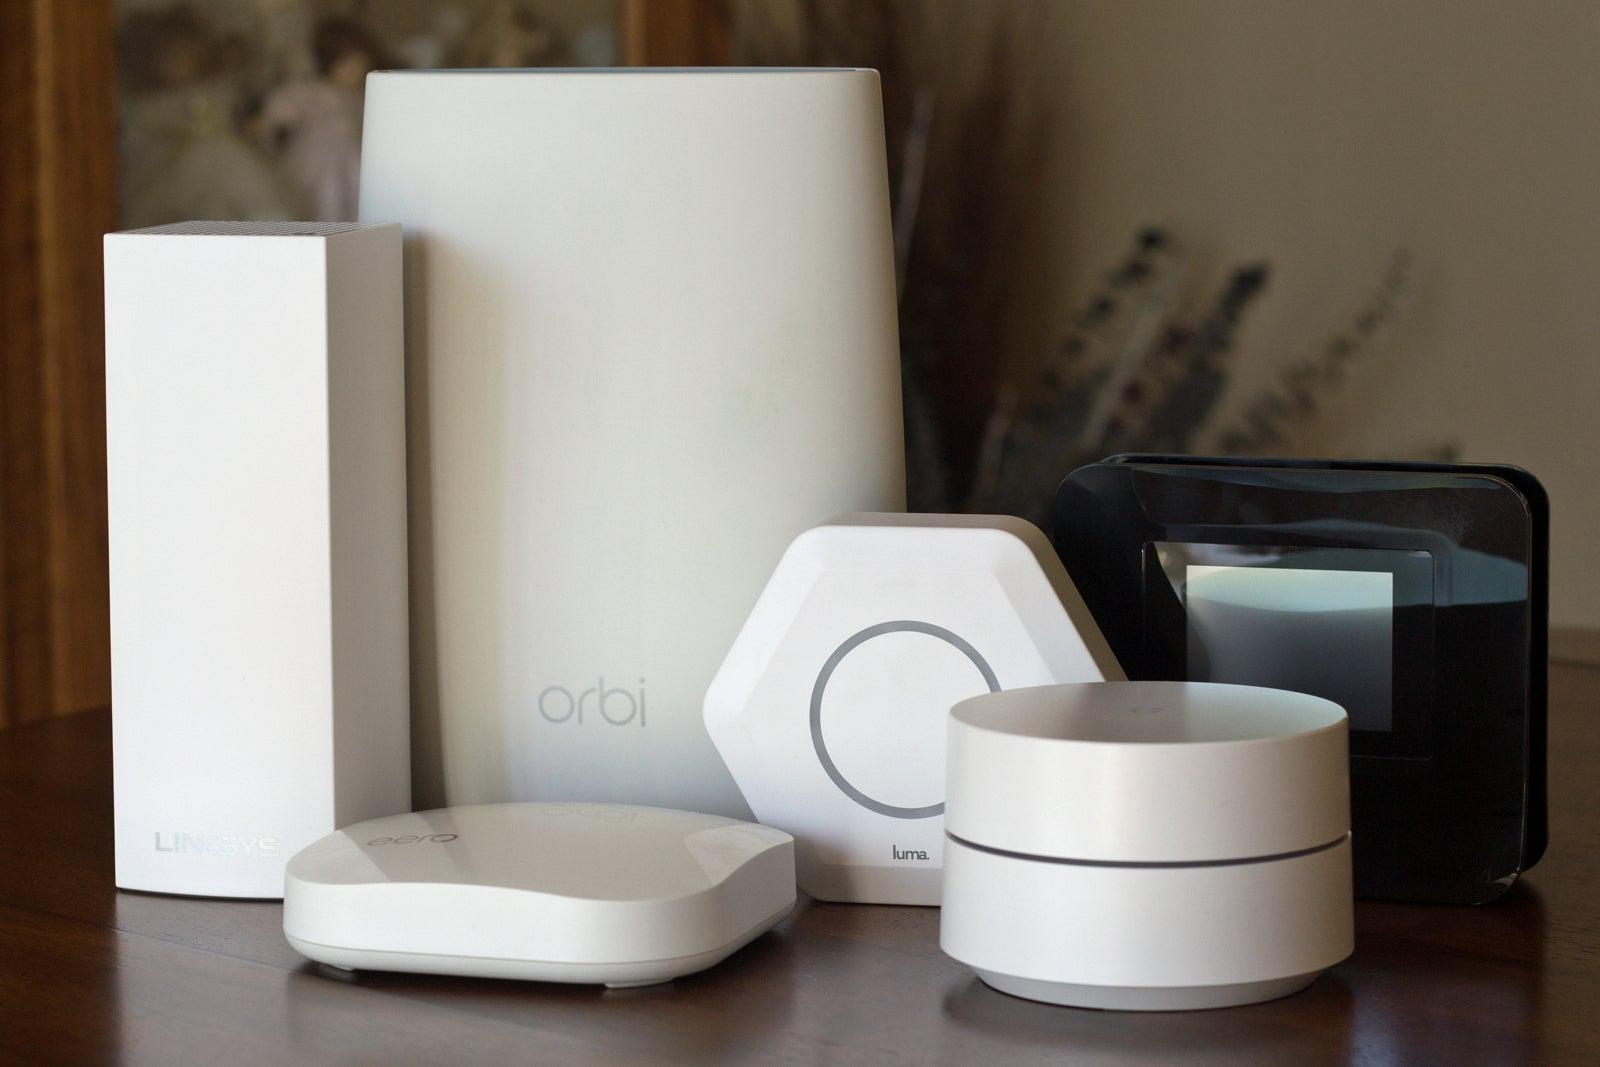 Netgear Orbi Home WiFi System (RBK50)